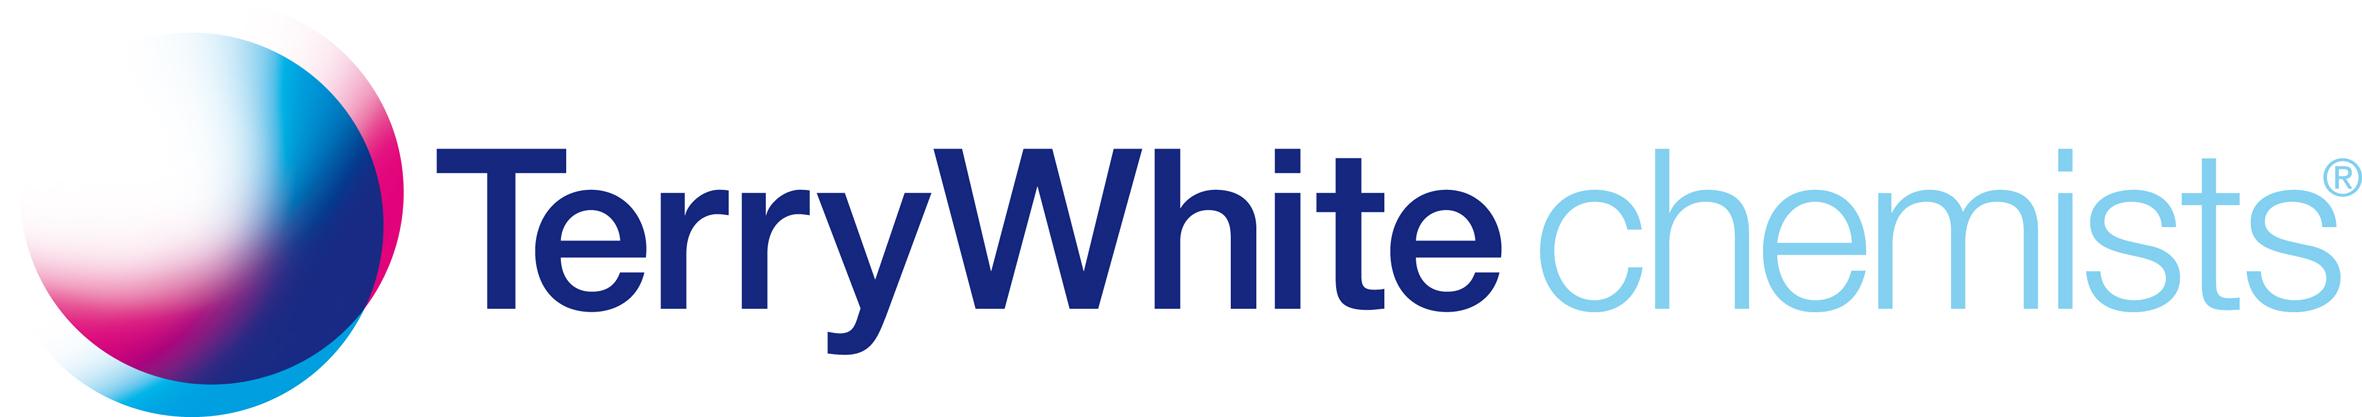 Terry-White-Chemist-logo